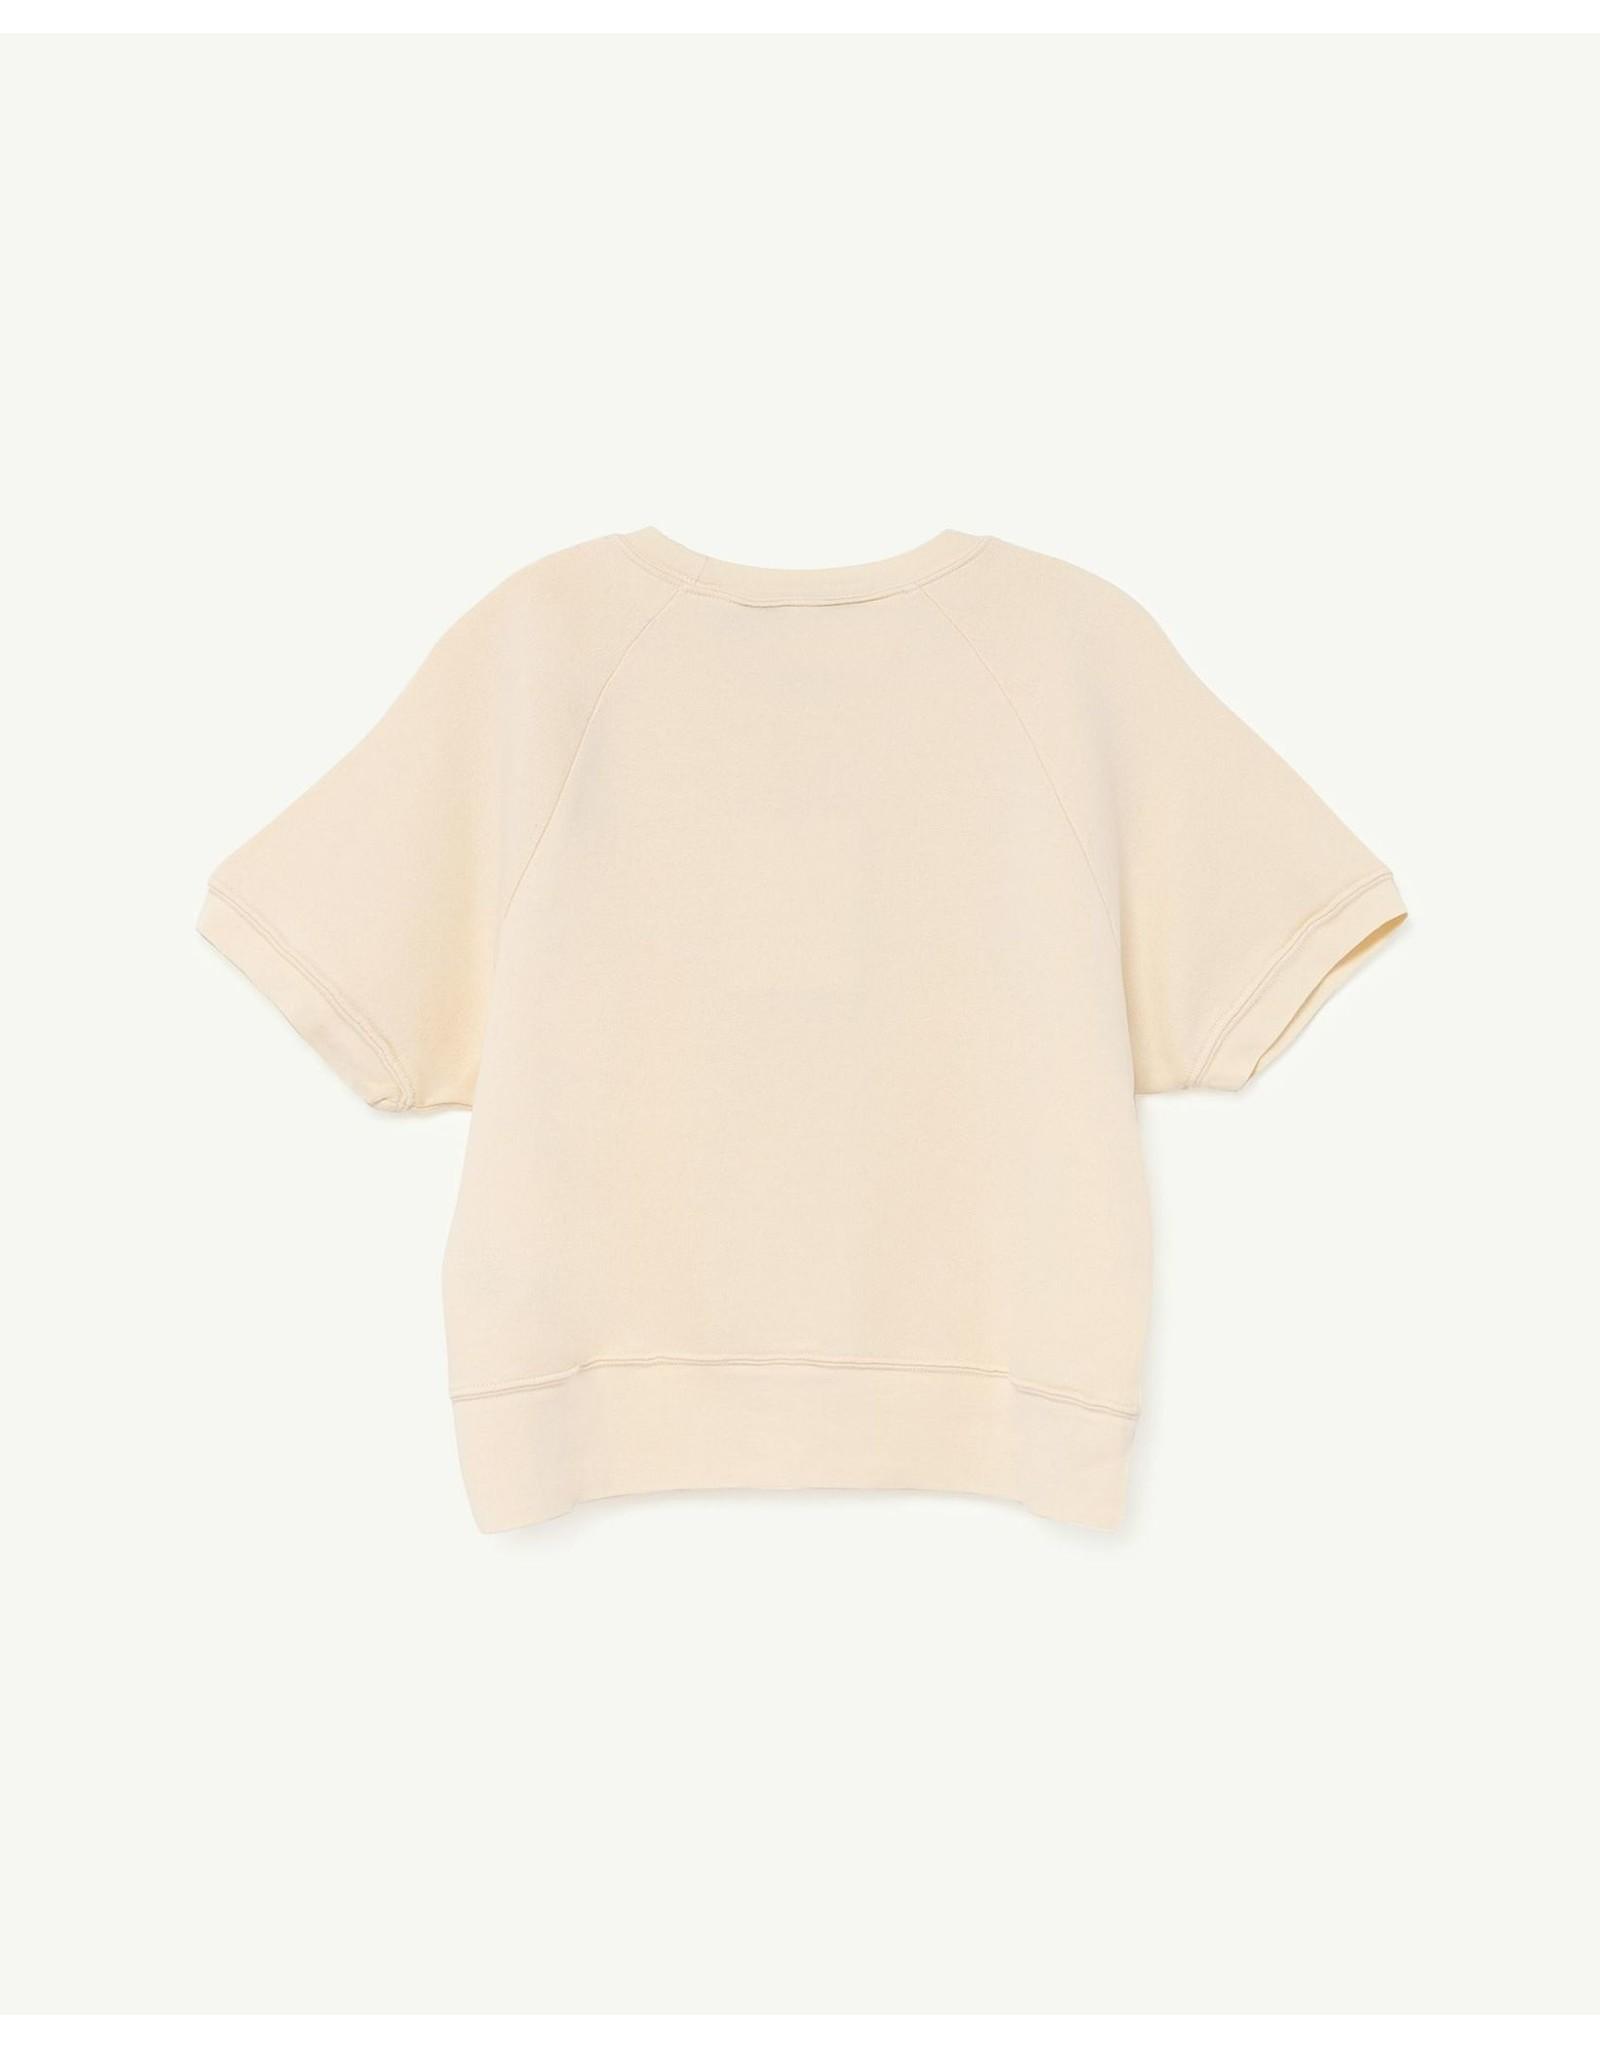 TAO PS21 007203AS Squab Kids T-Shirt white